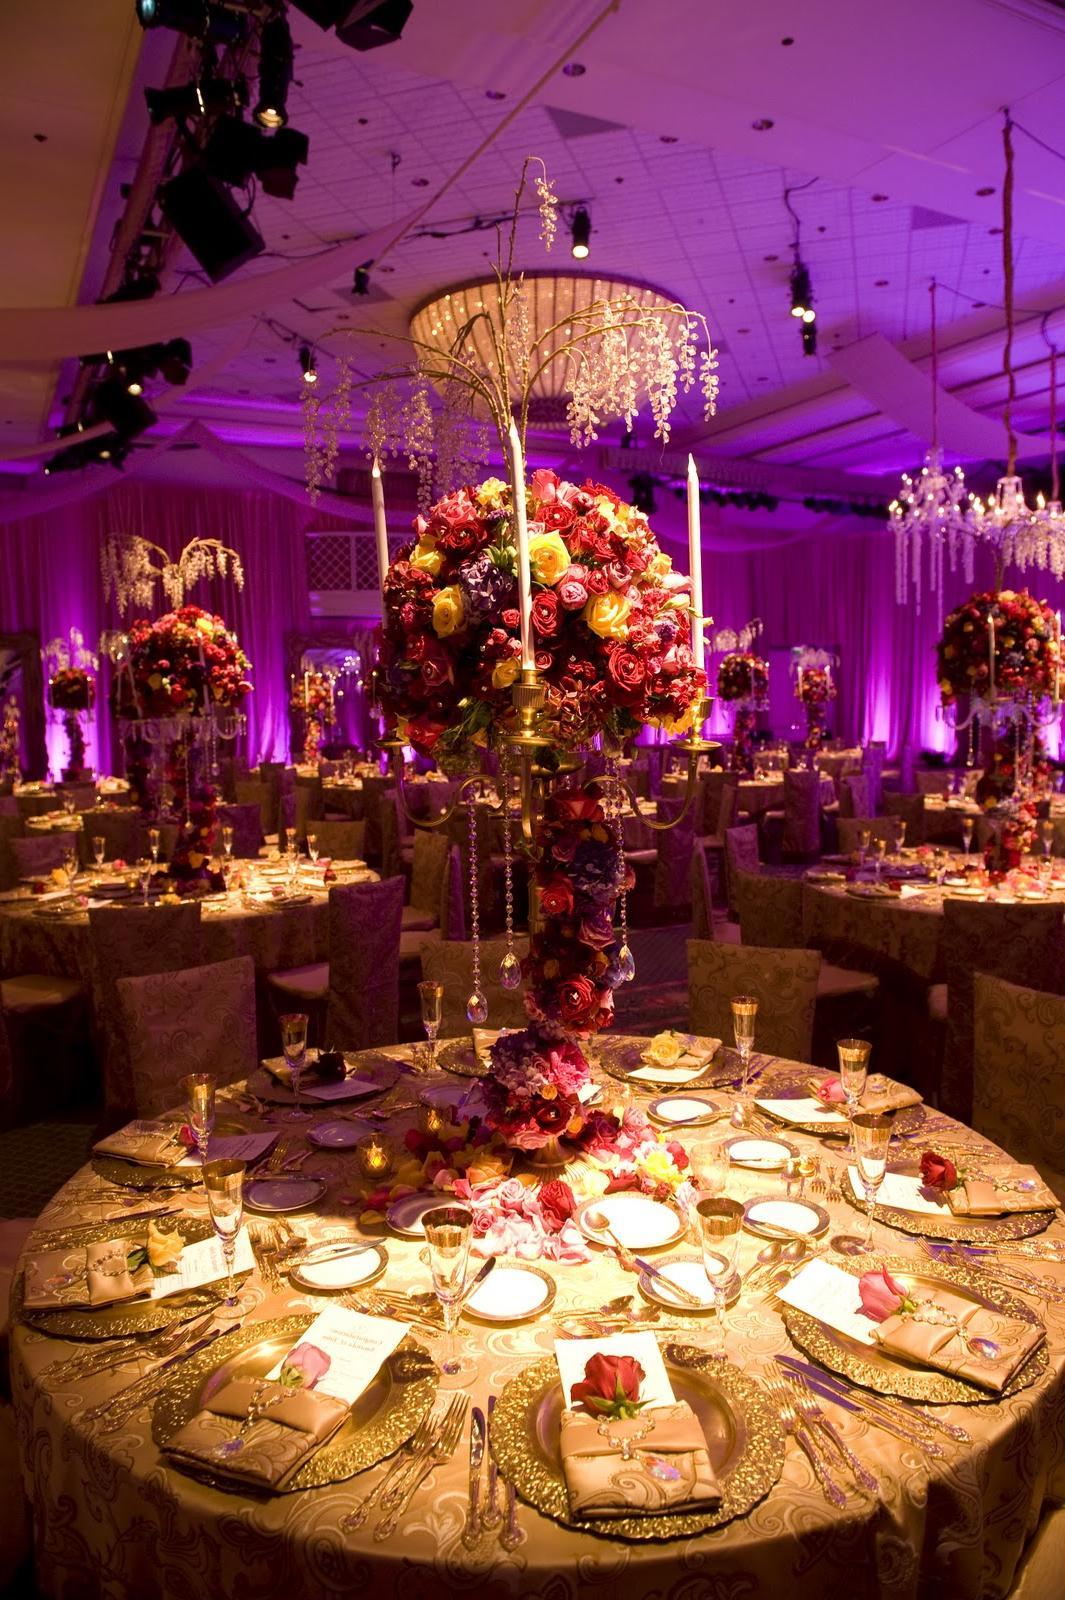 Best David Tutera Wedding Centerpieces Contemporary - Styles & Ideas ...